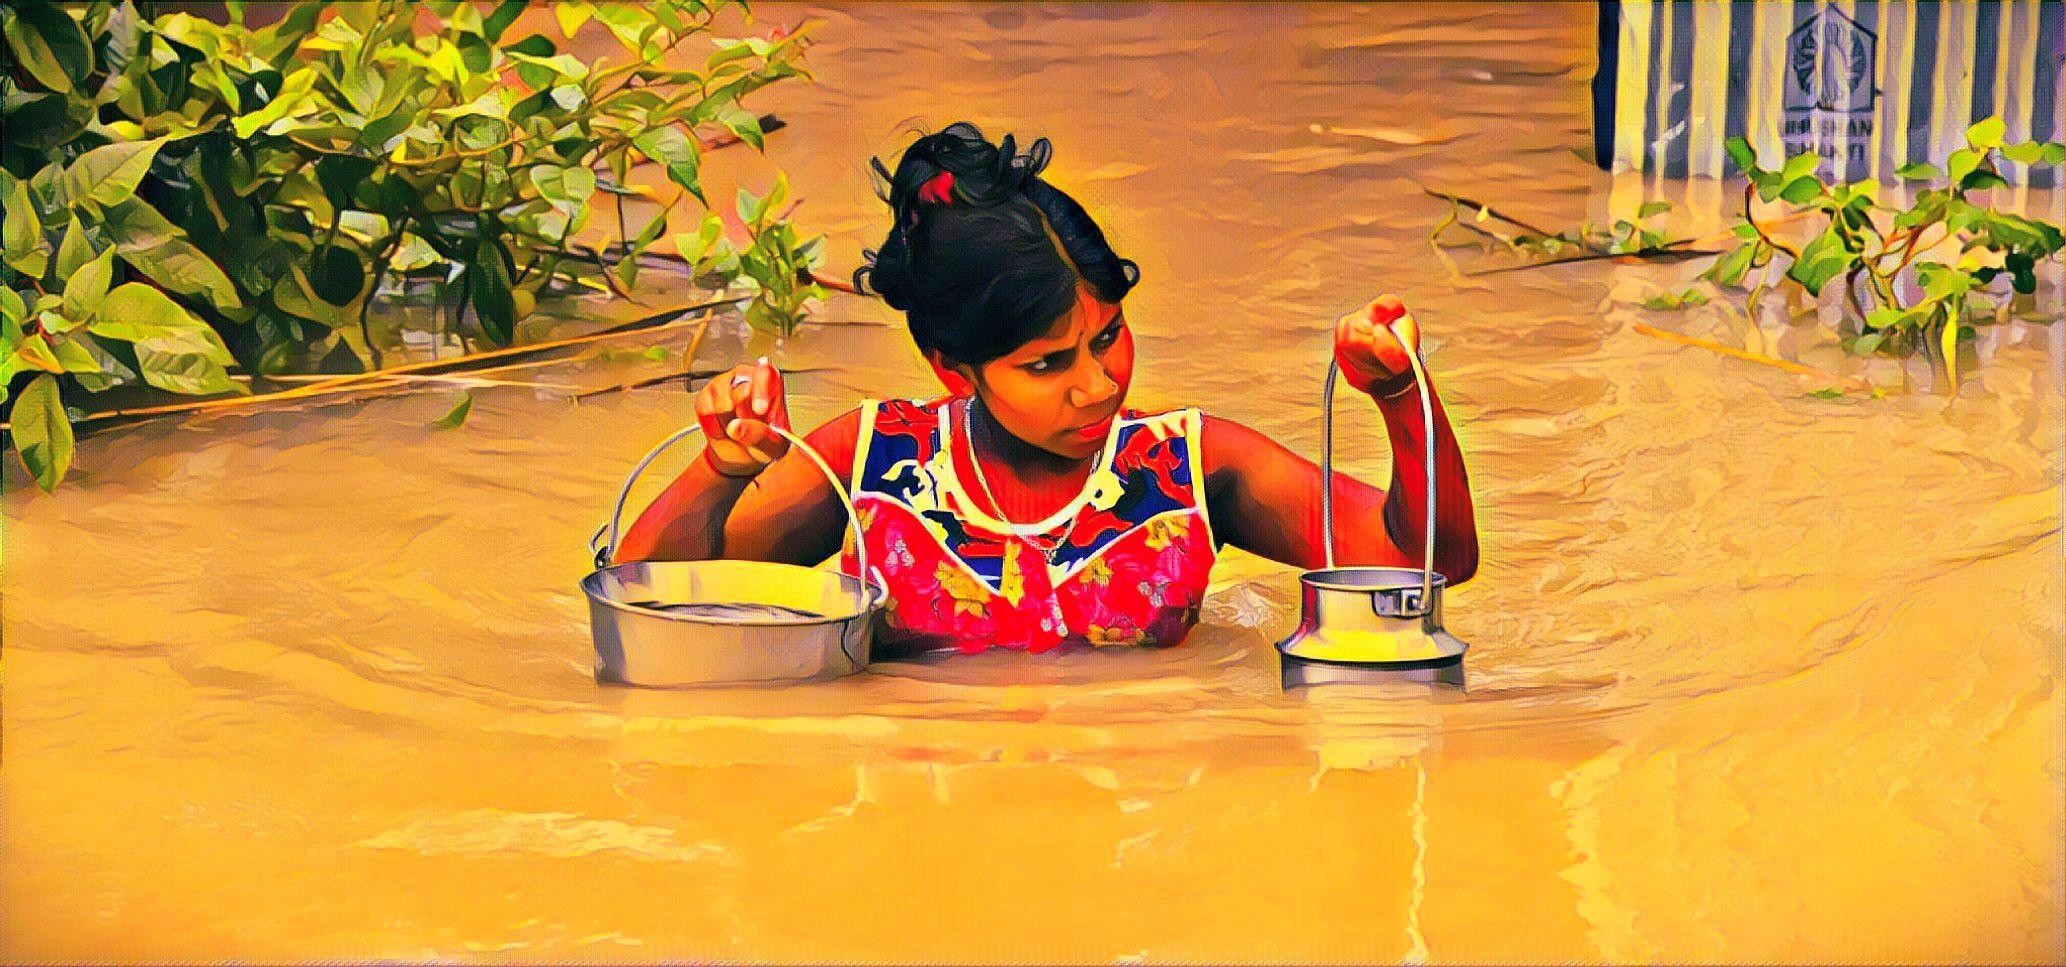 world flood